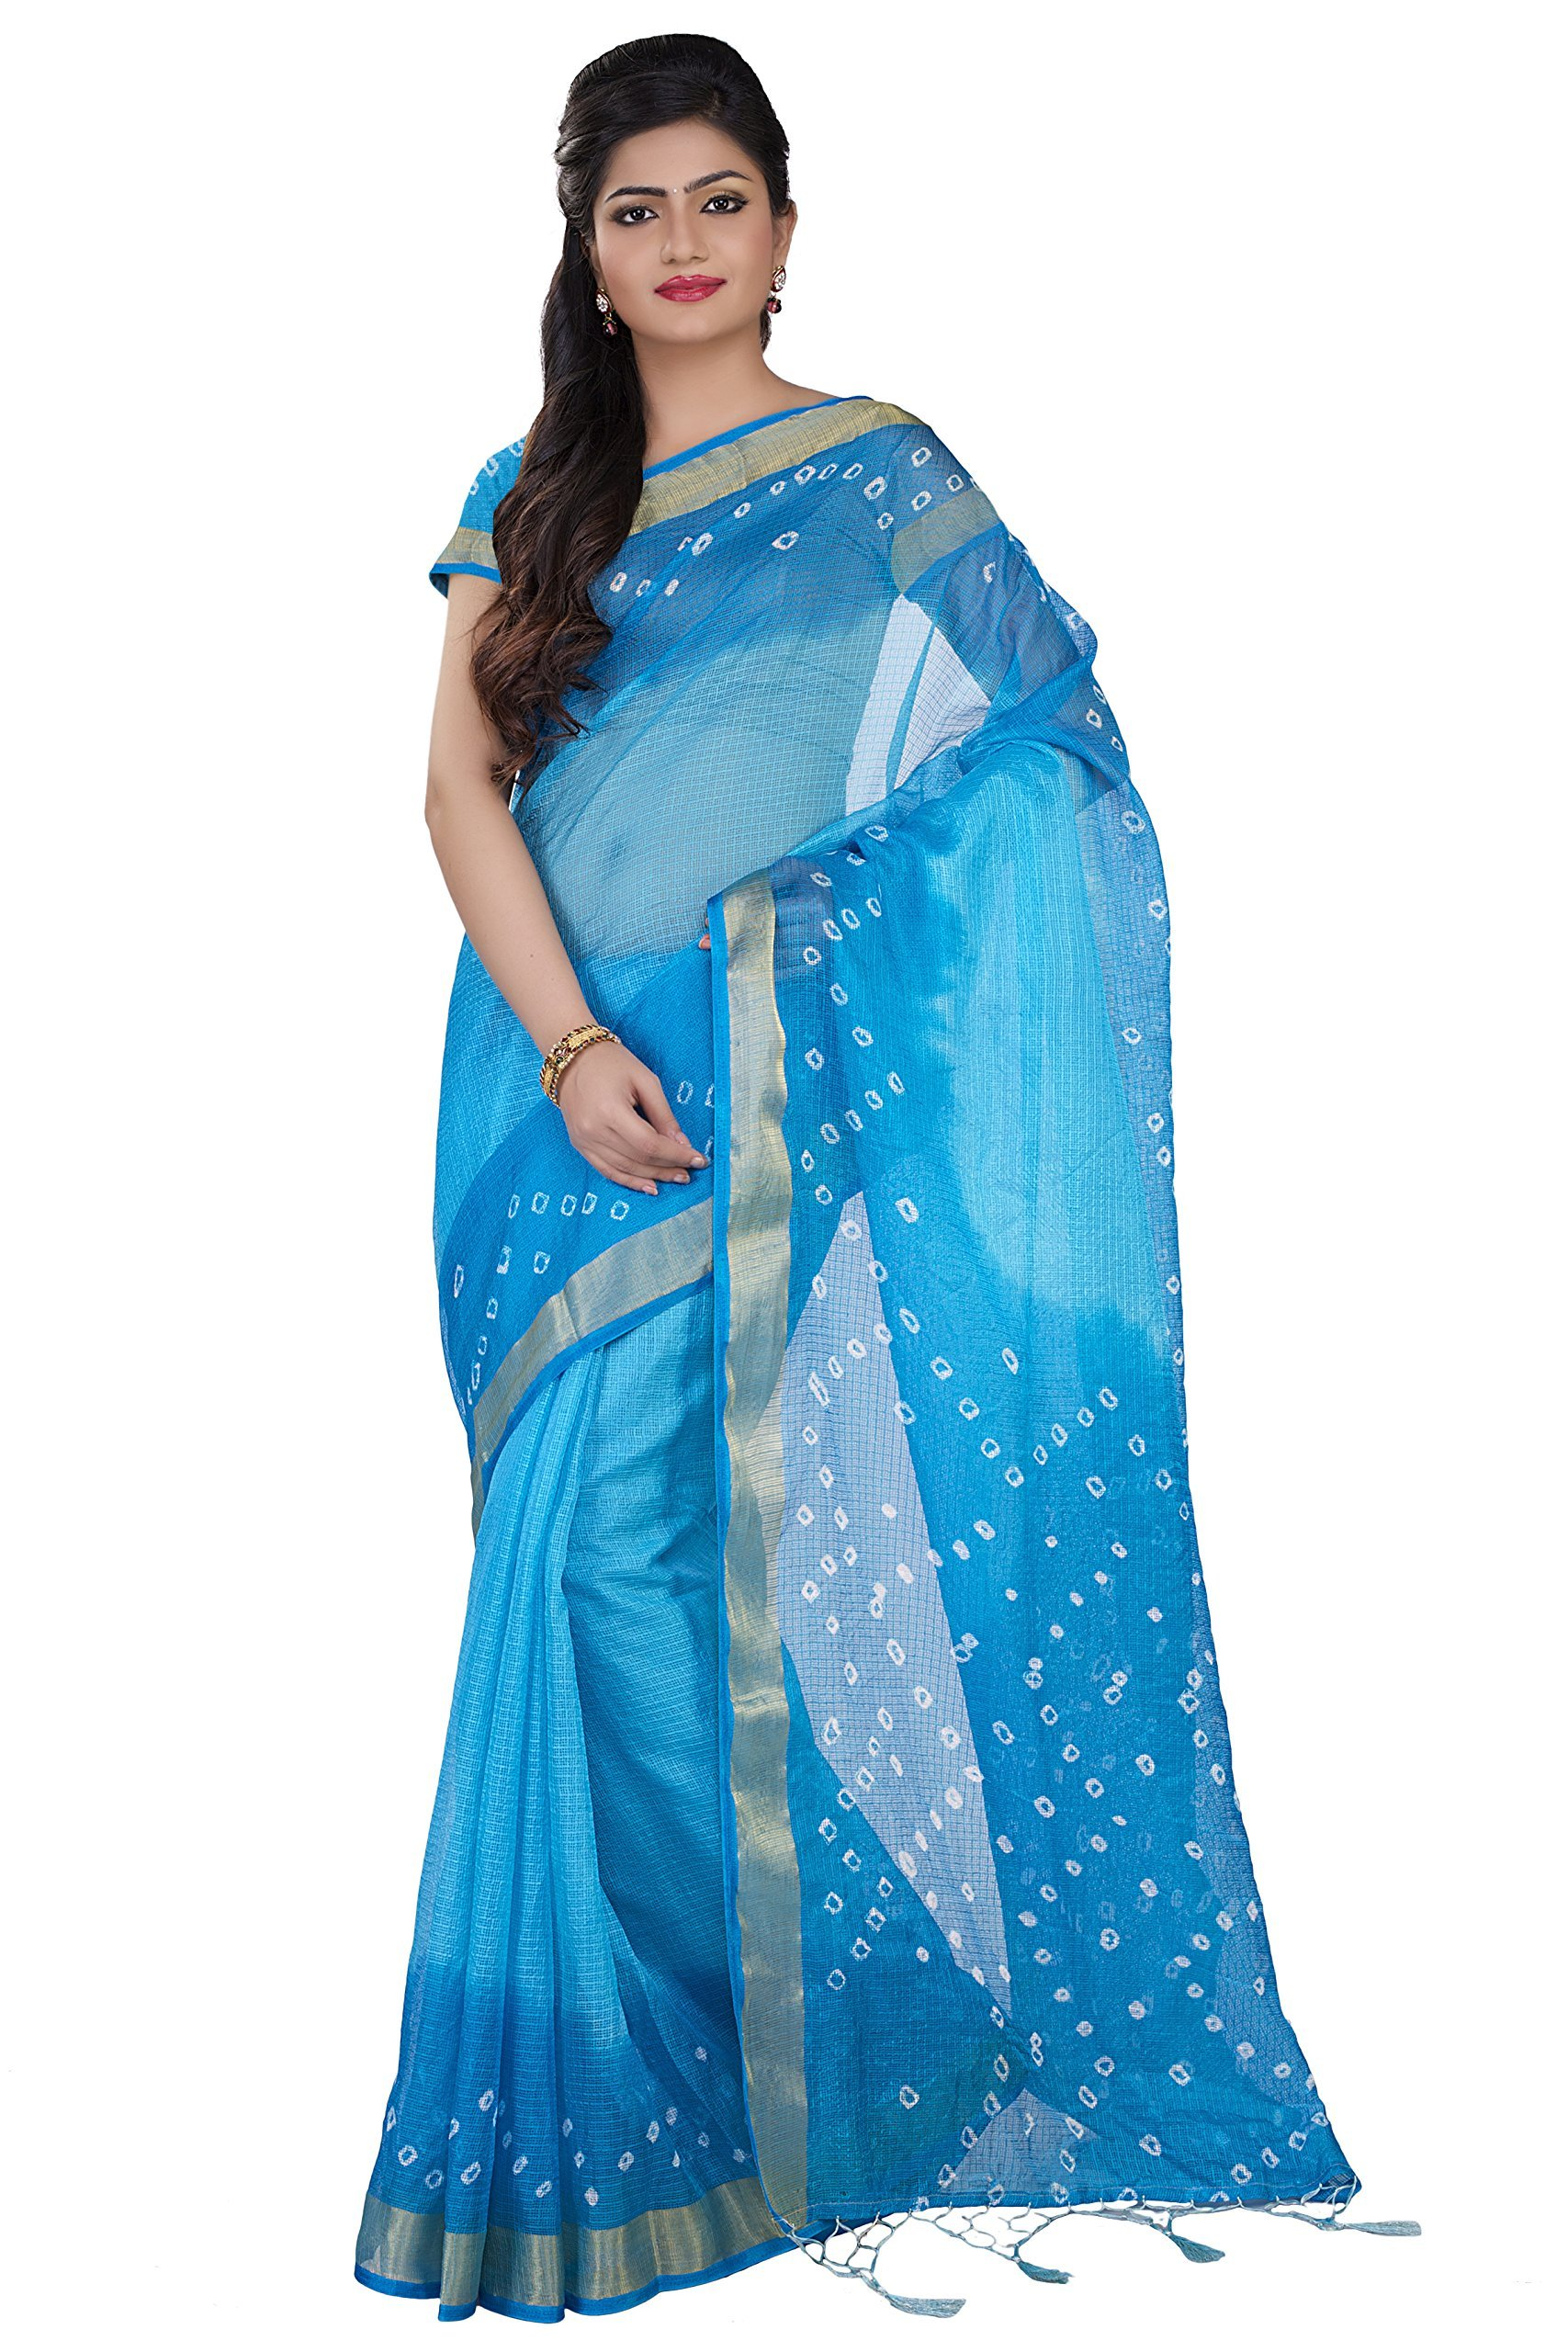 Rajnandini Women's Bandhani Printed Kota Silk Cotton Saree(JOPLSRS1024C_Blue_Free Size)